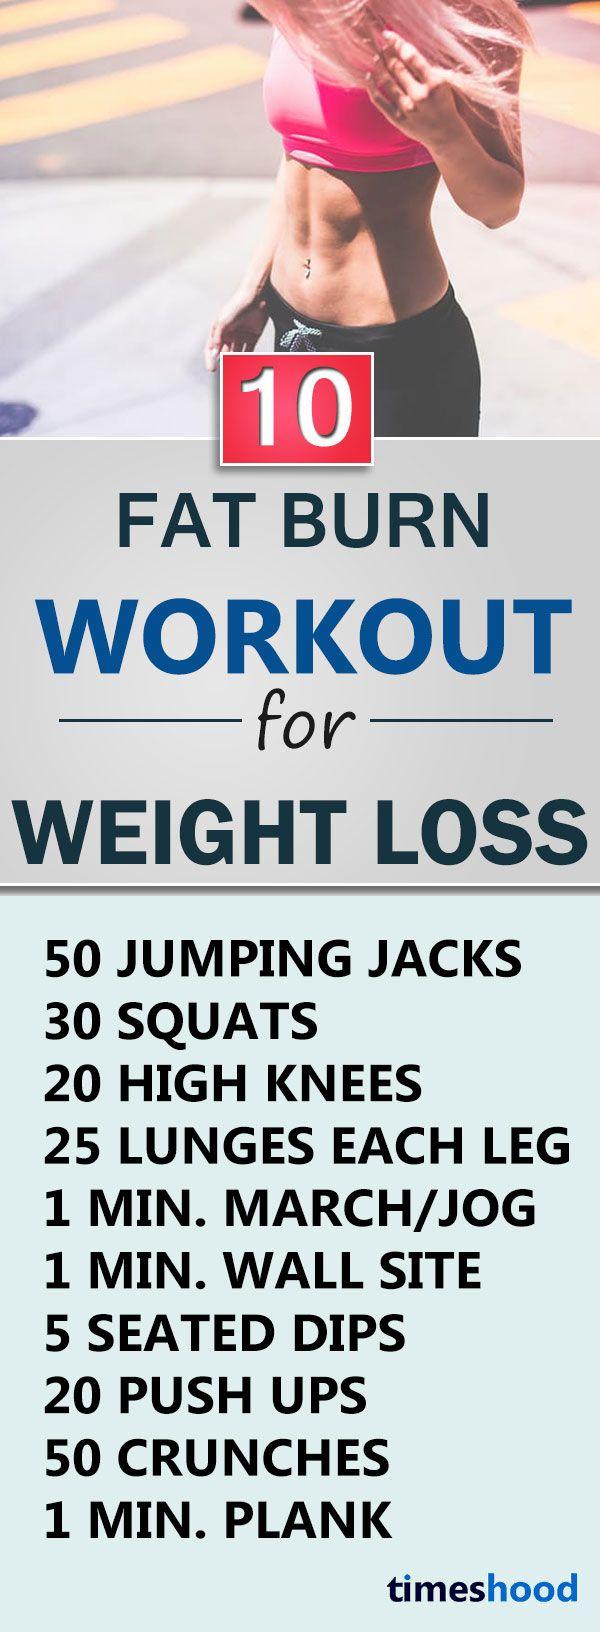 Free online low carb diet plan image 10